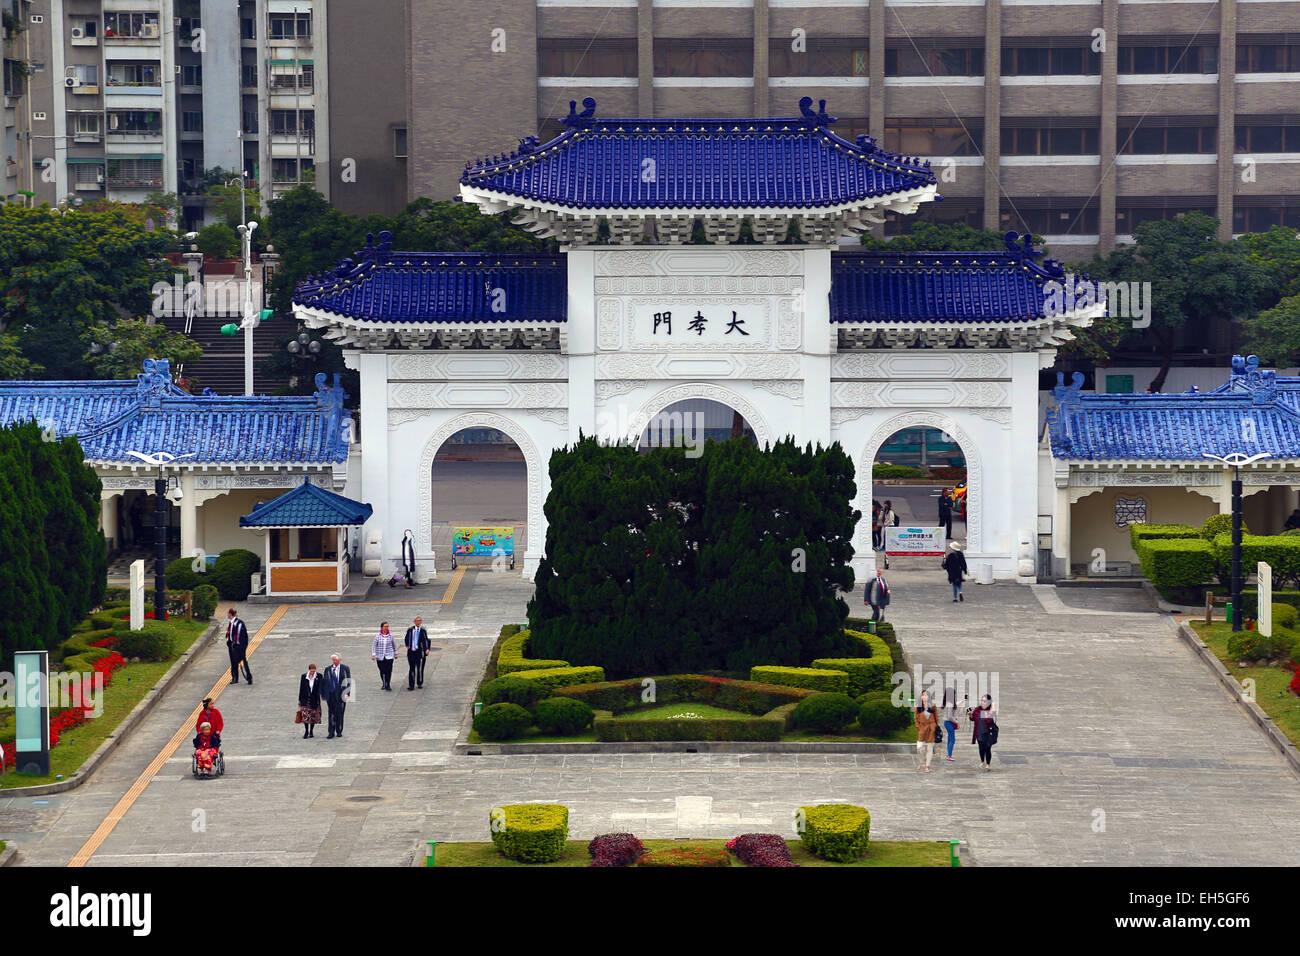 The Gate of Great Piety at the Chiang Kai-shek Memorial Hall, Taipei, Taiwan - Stock Image